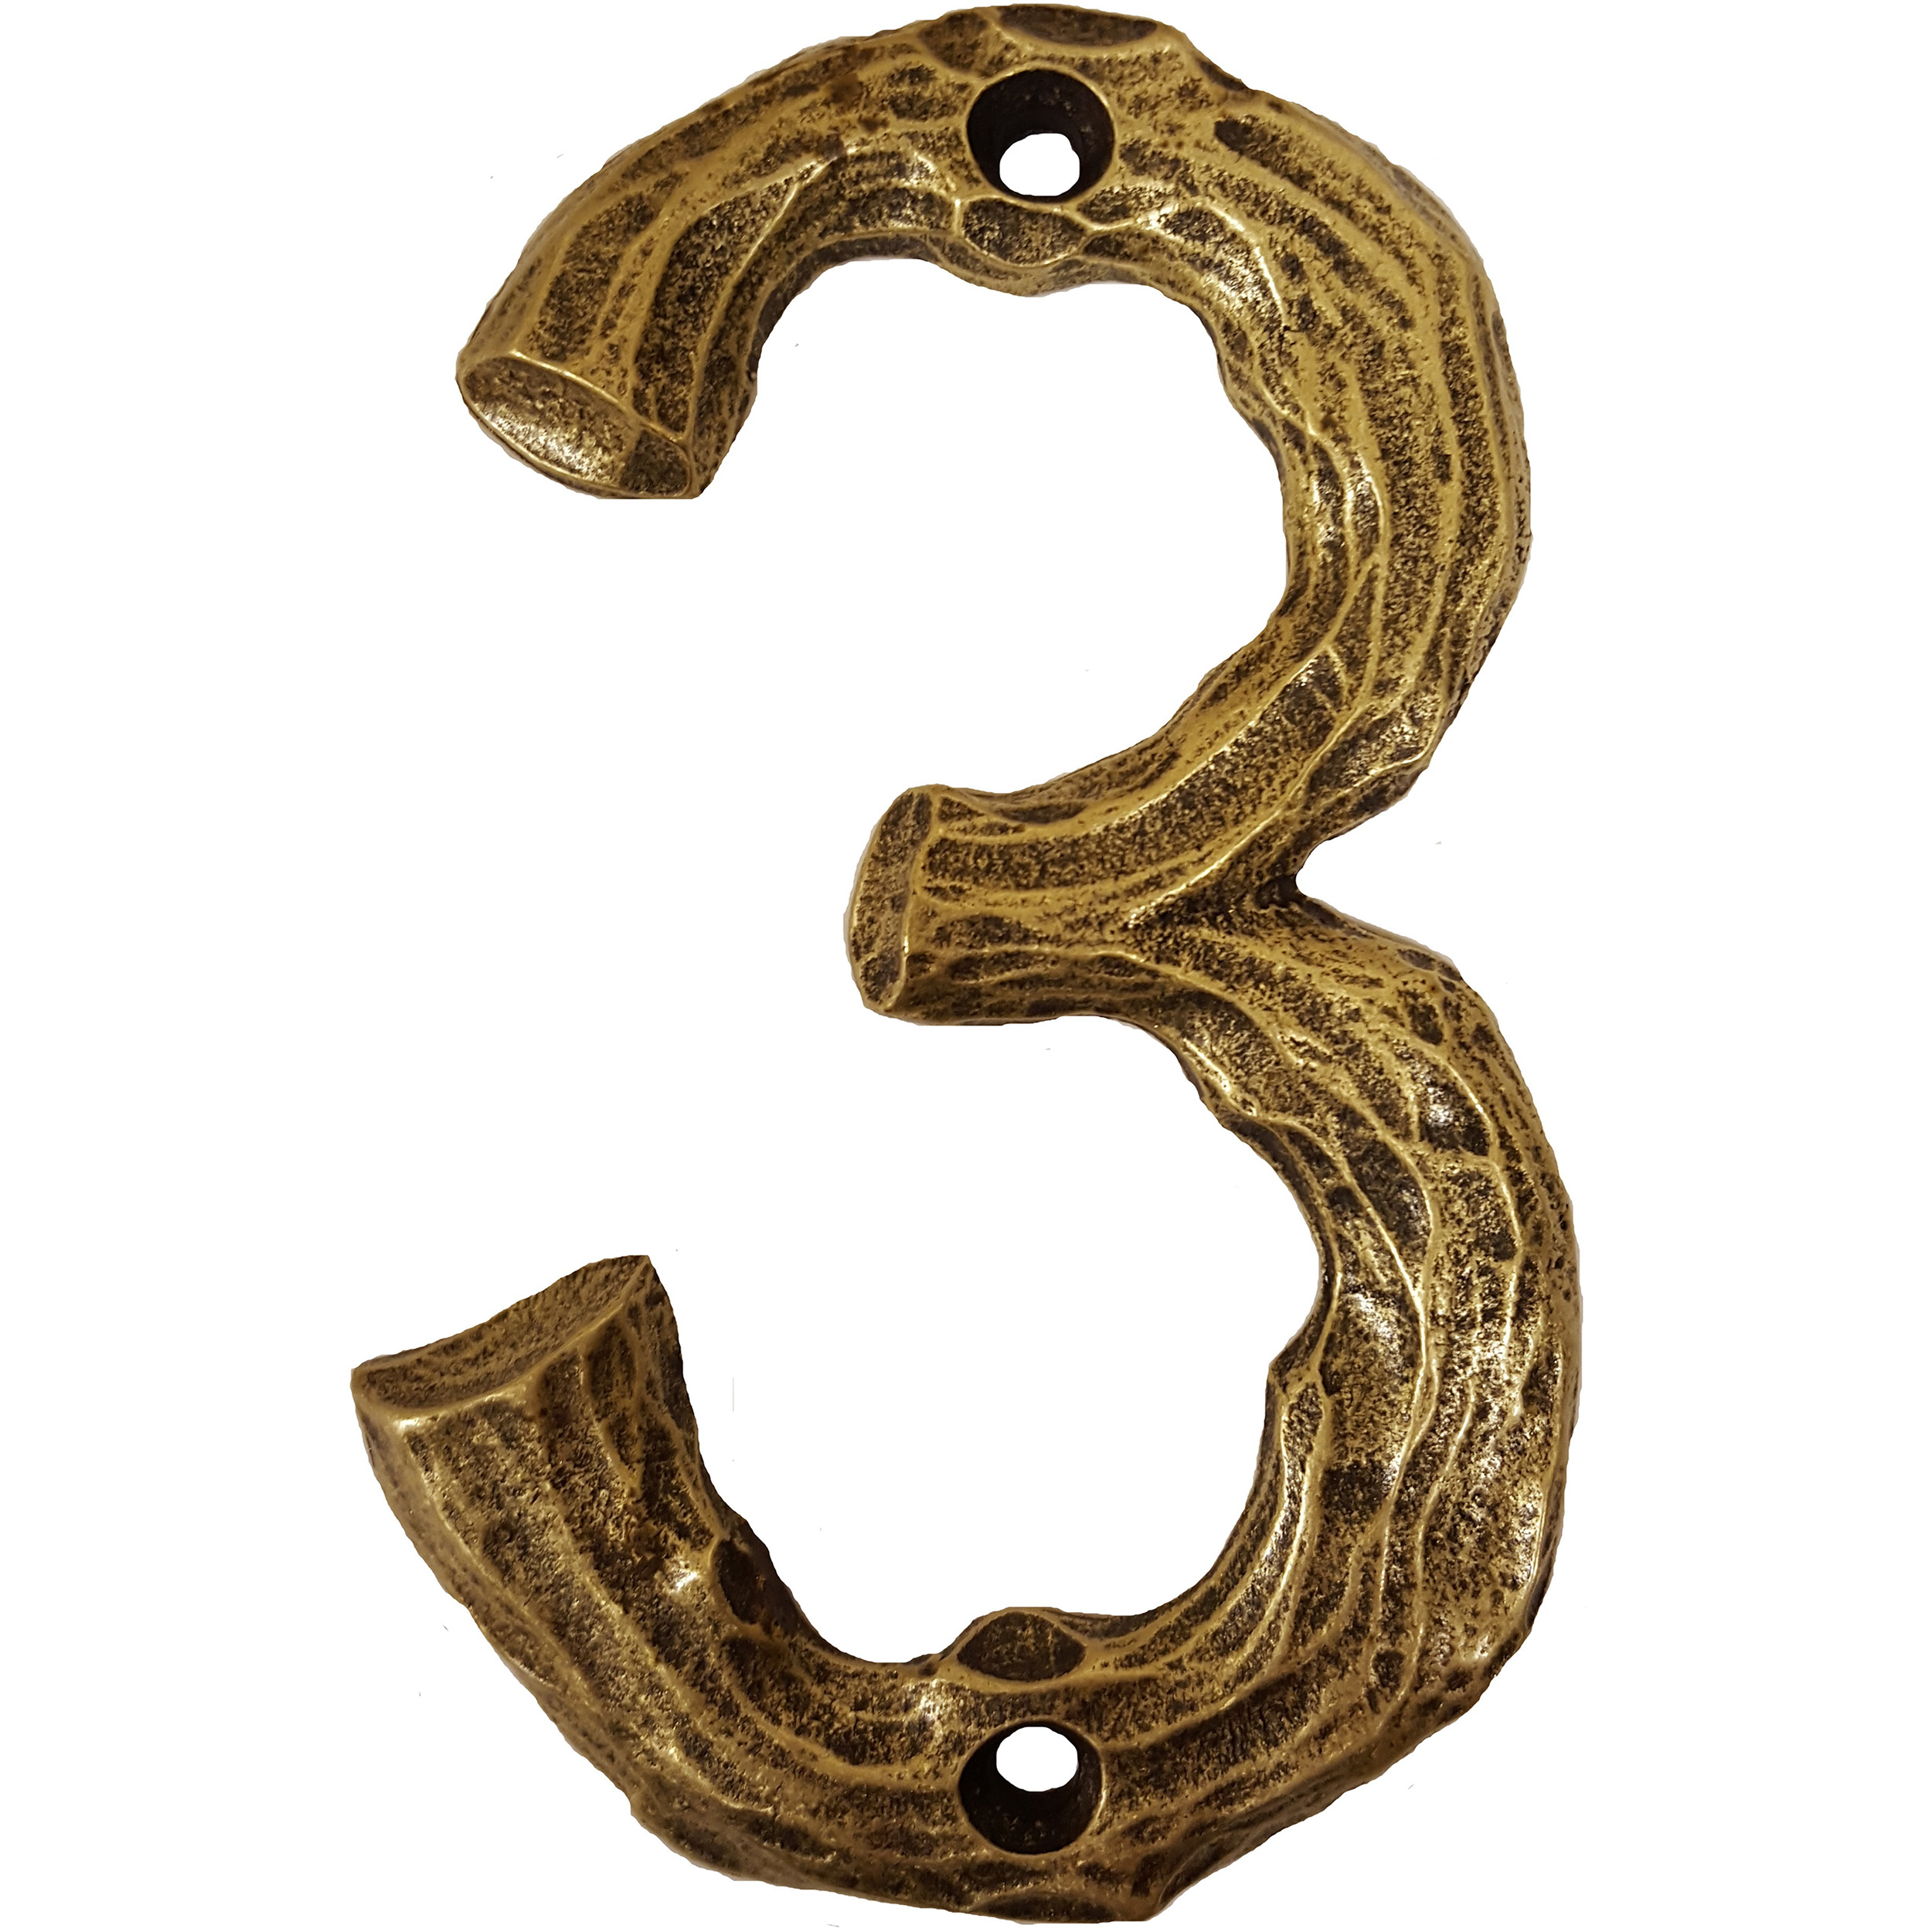 LHN3-AB Log House Number 3, Antique Brass, 1 piece